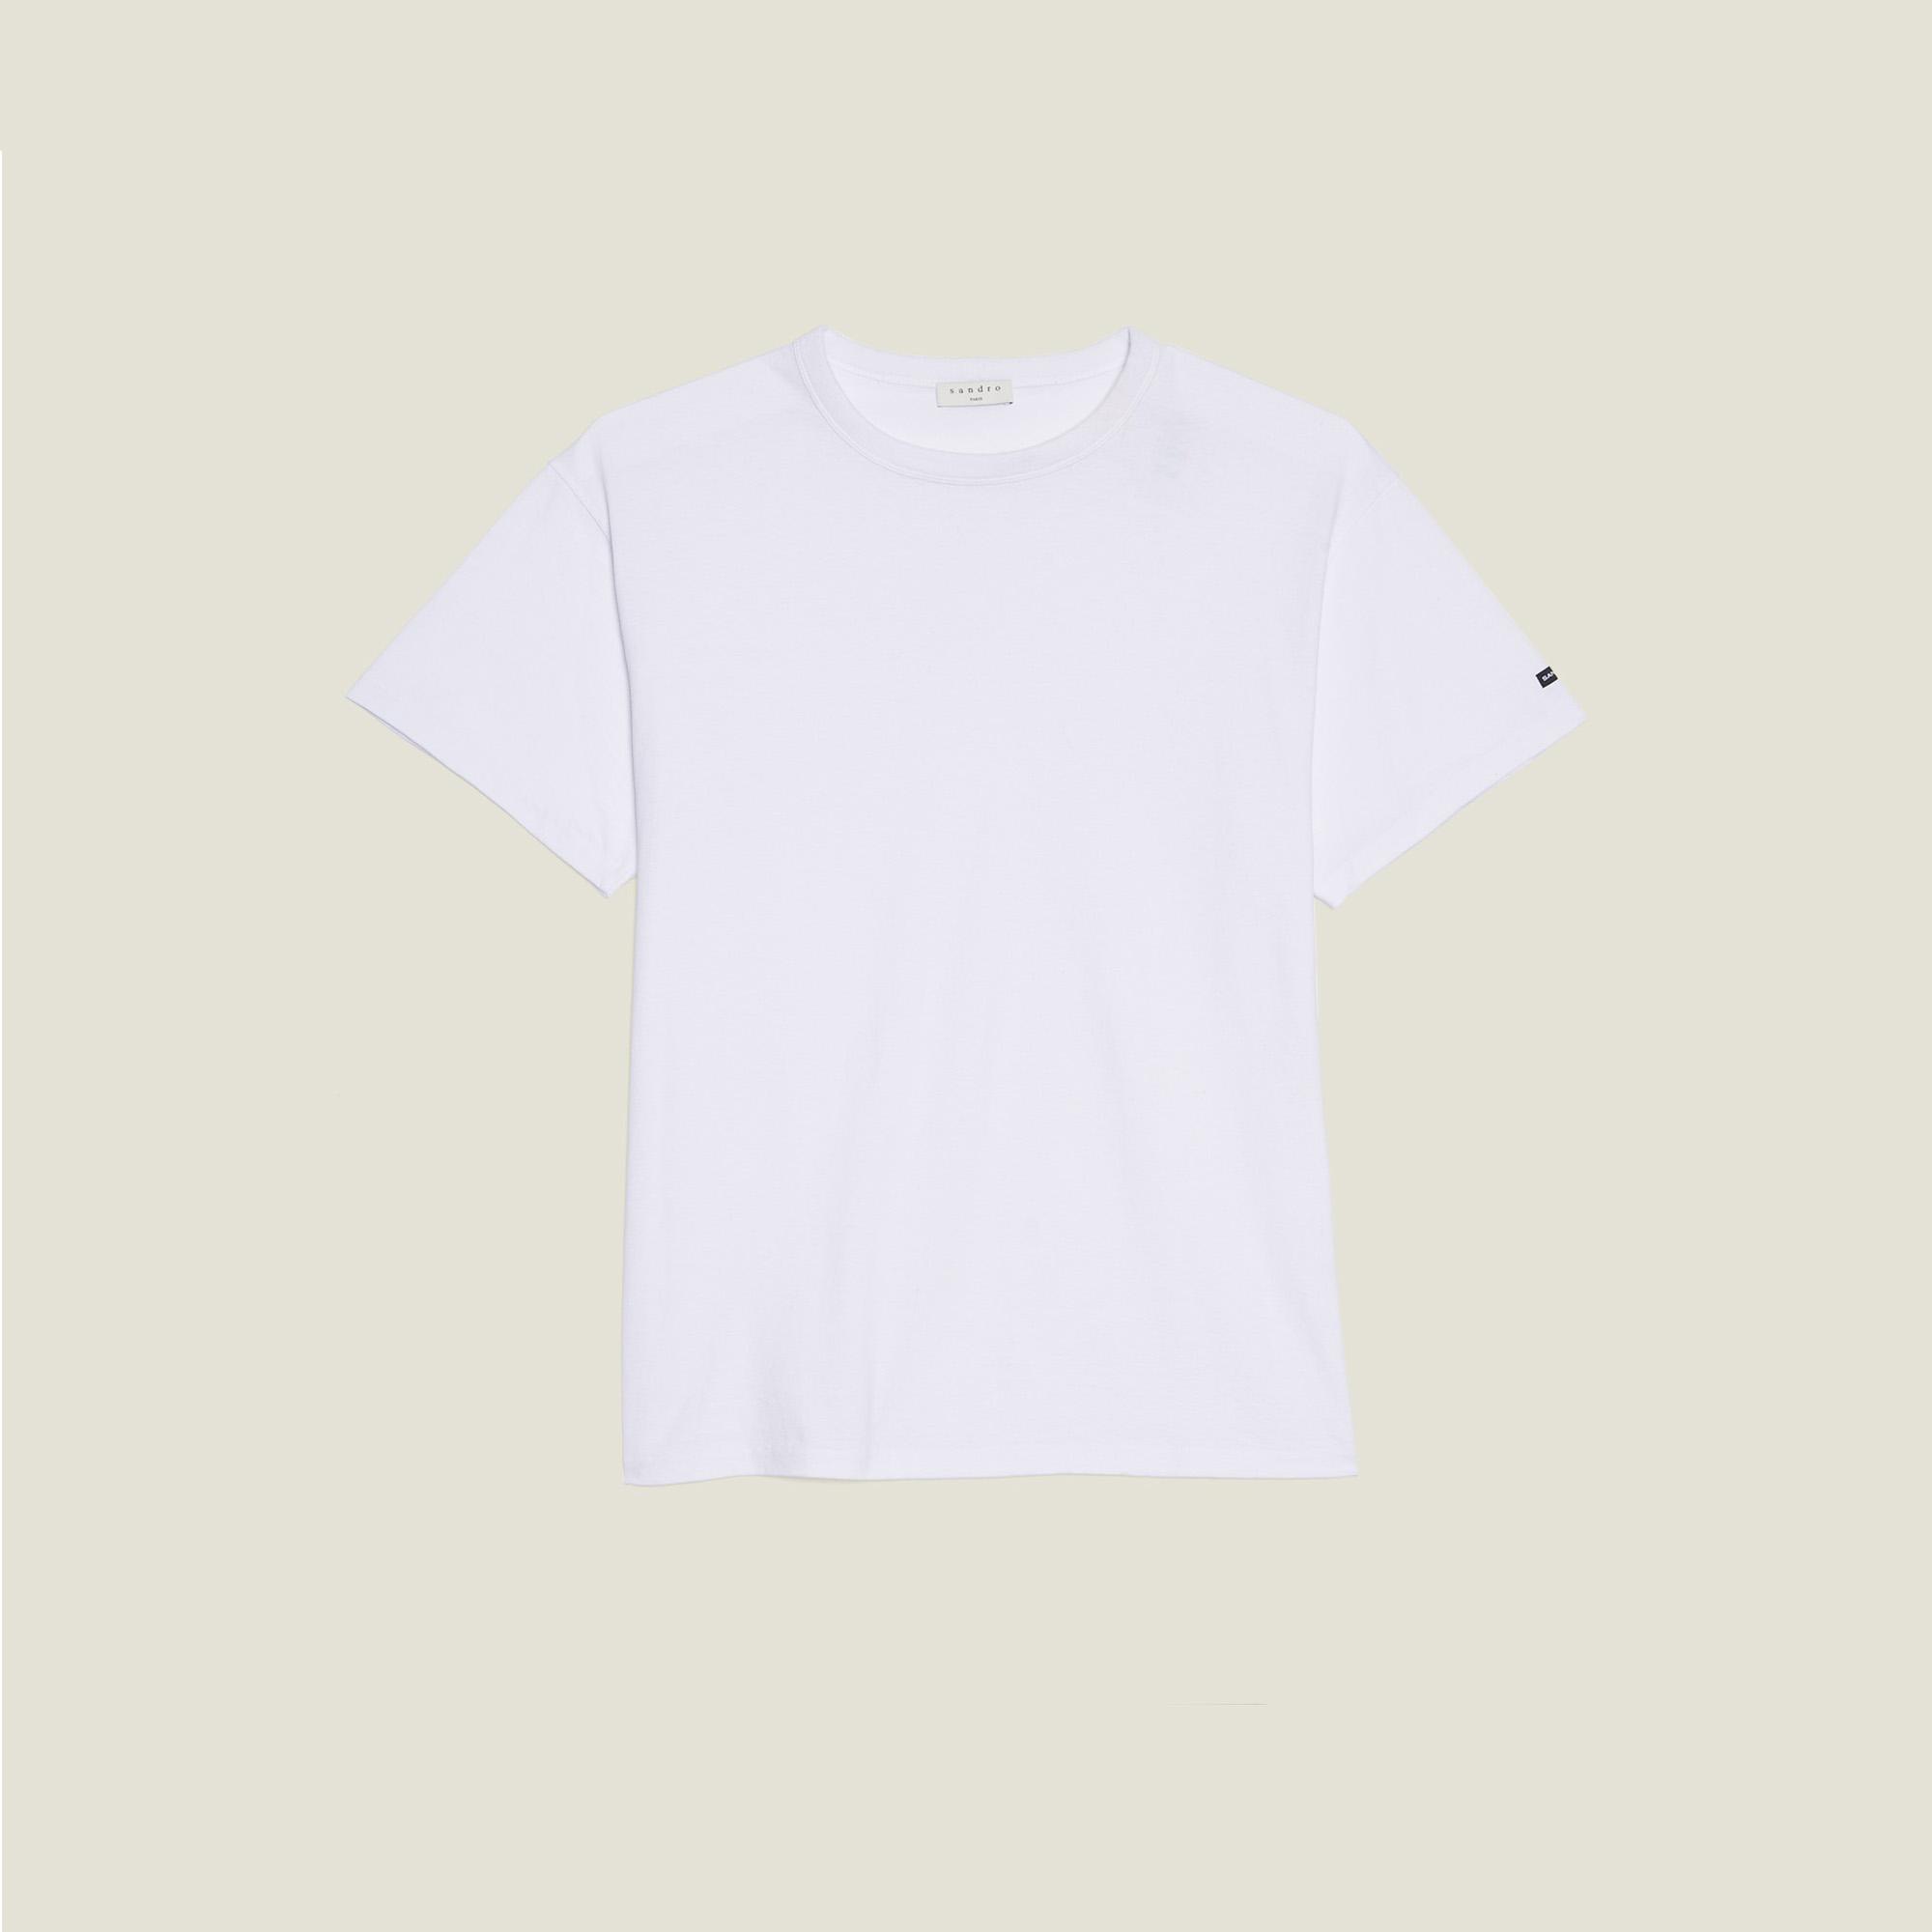 7c3f78defa388c ... Cotton Oversized T-Shirt : T-shirts & Polo shirts color white